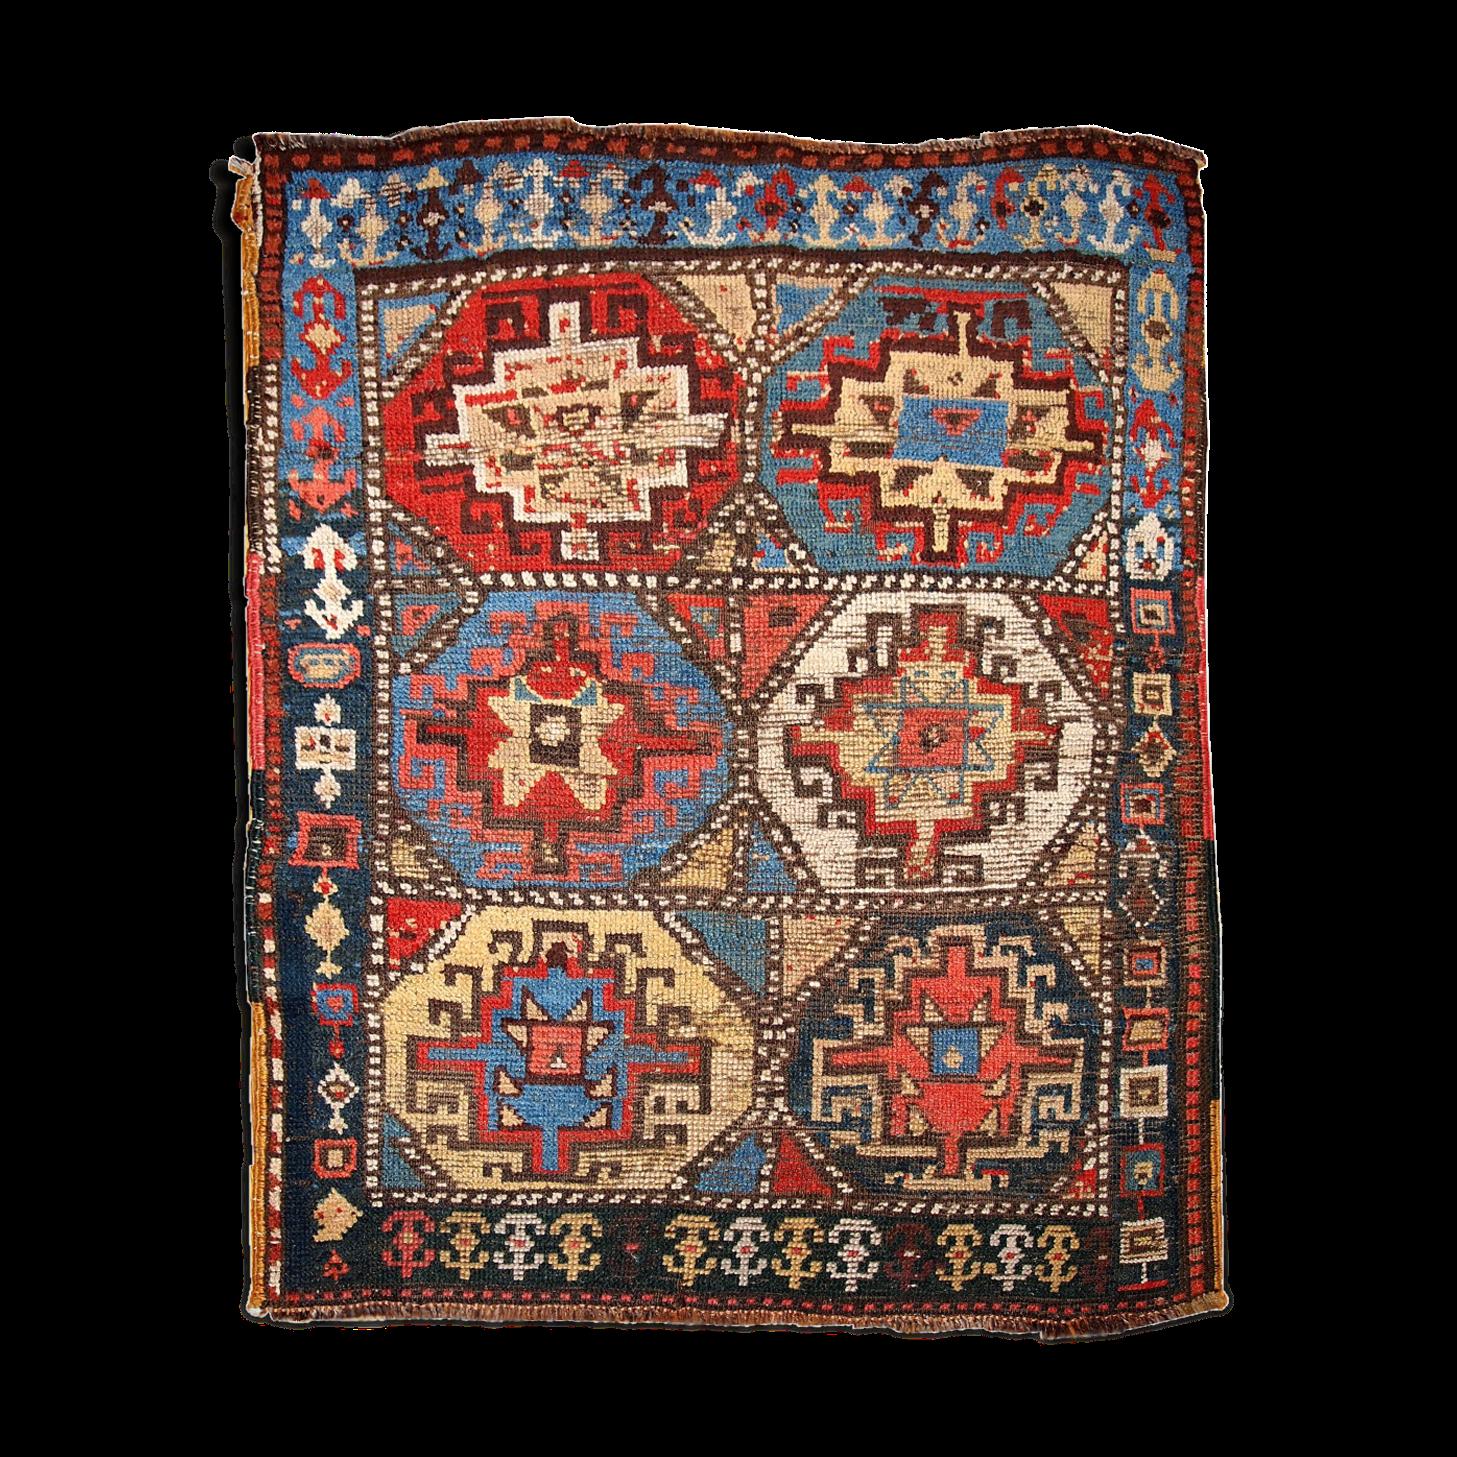 Tapis Ancien Collectable Persan Kurdish Fait Main 106 X 140cm Tapis Fait Main Et Persan